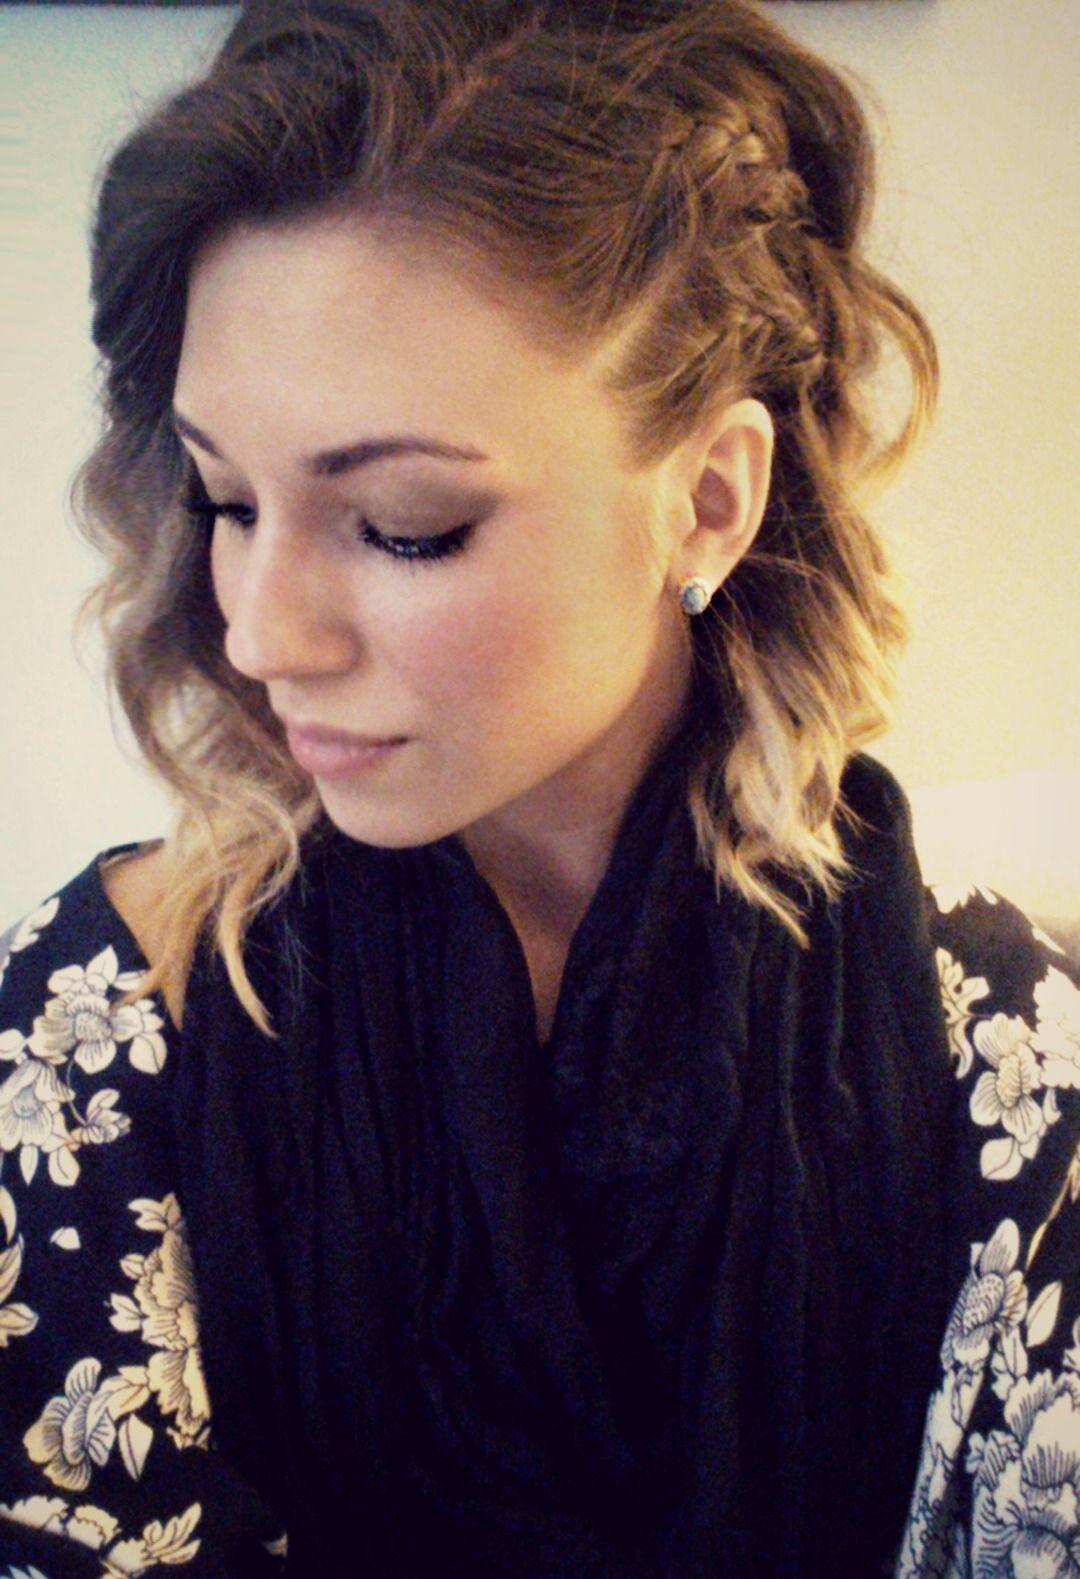 30+ Braid on side of head with curls ideas